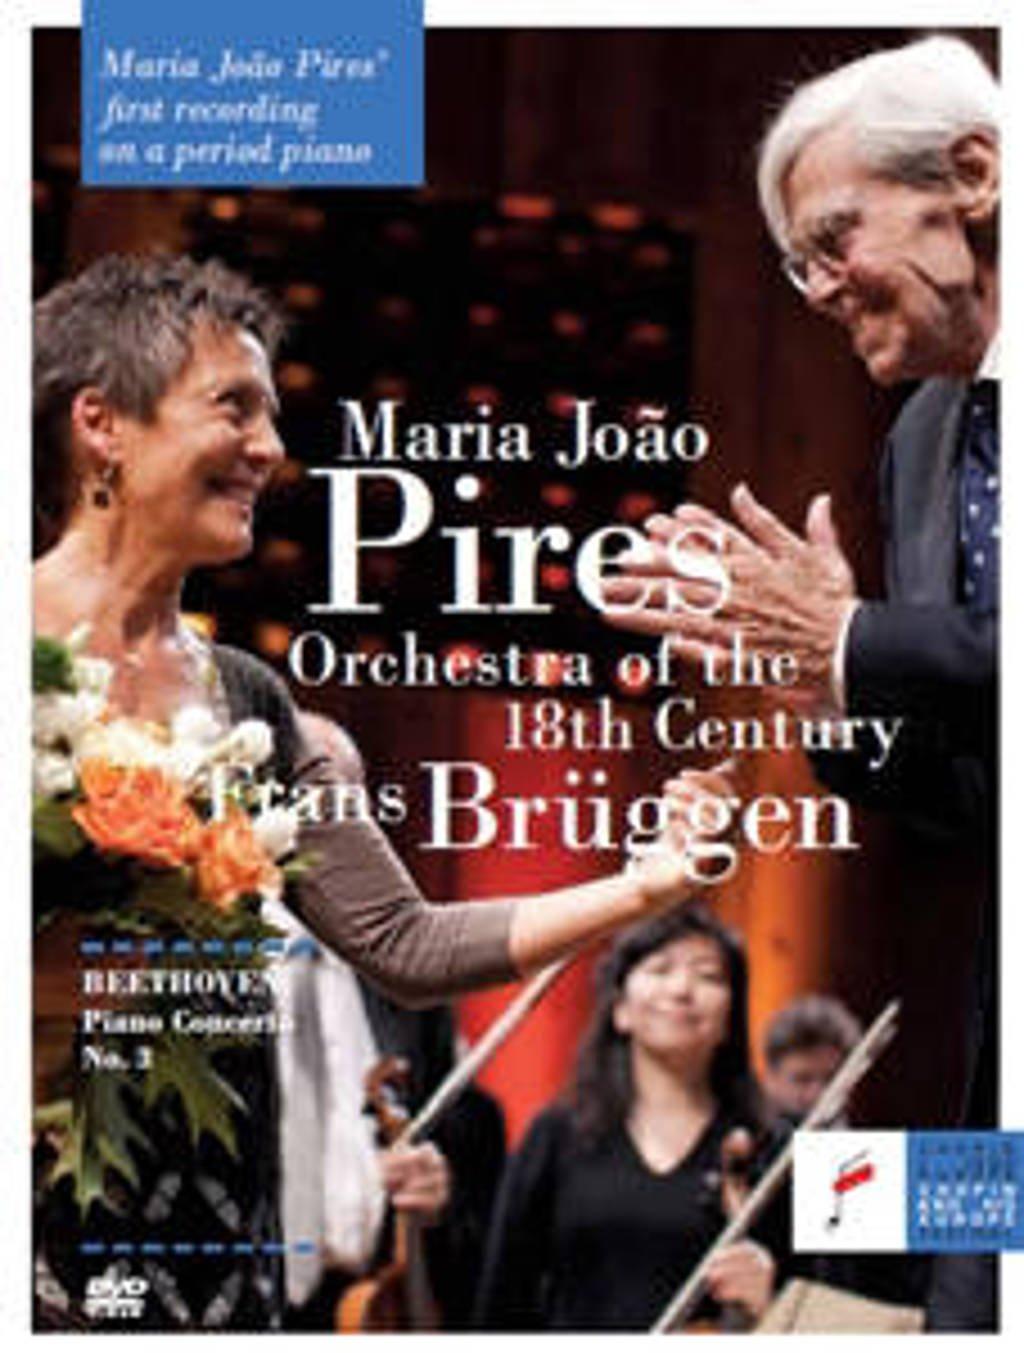 Maria Joao Pires - Beethoven Piano Concerto No.3 (DVD)